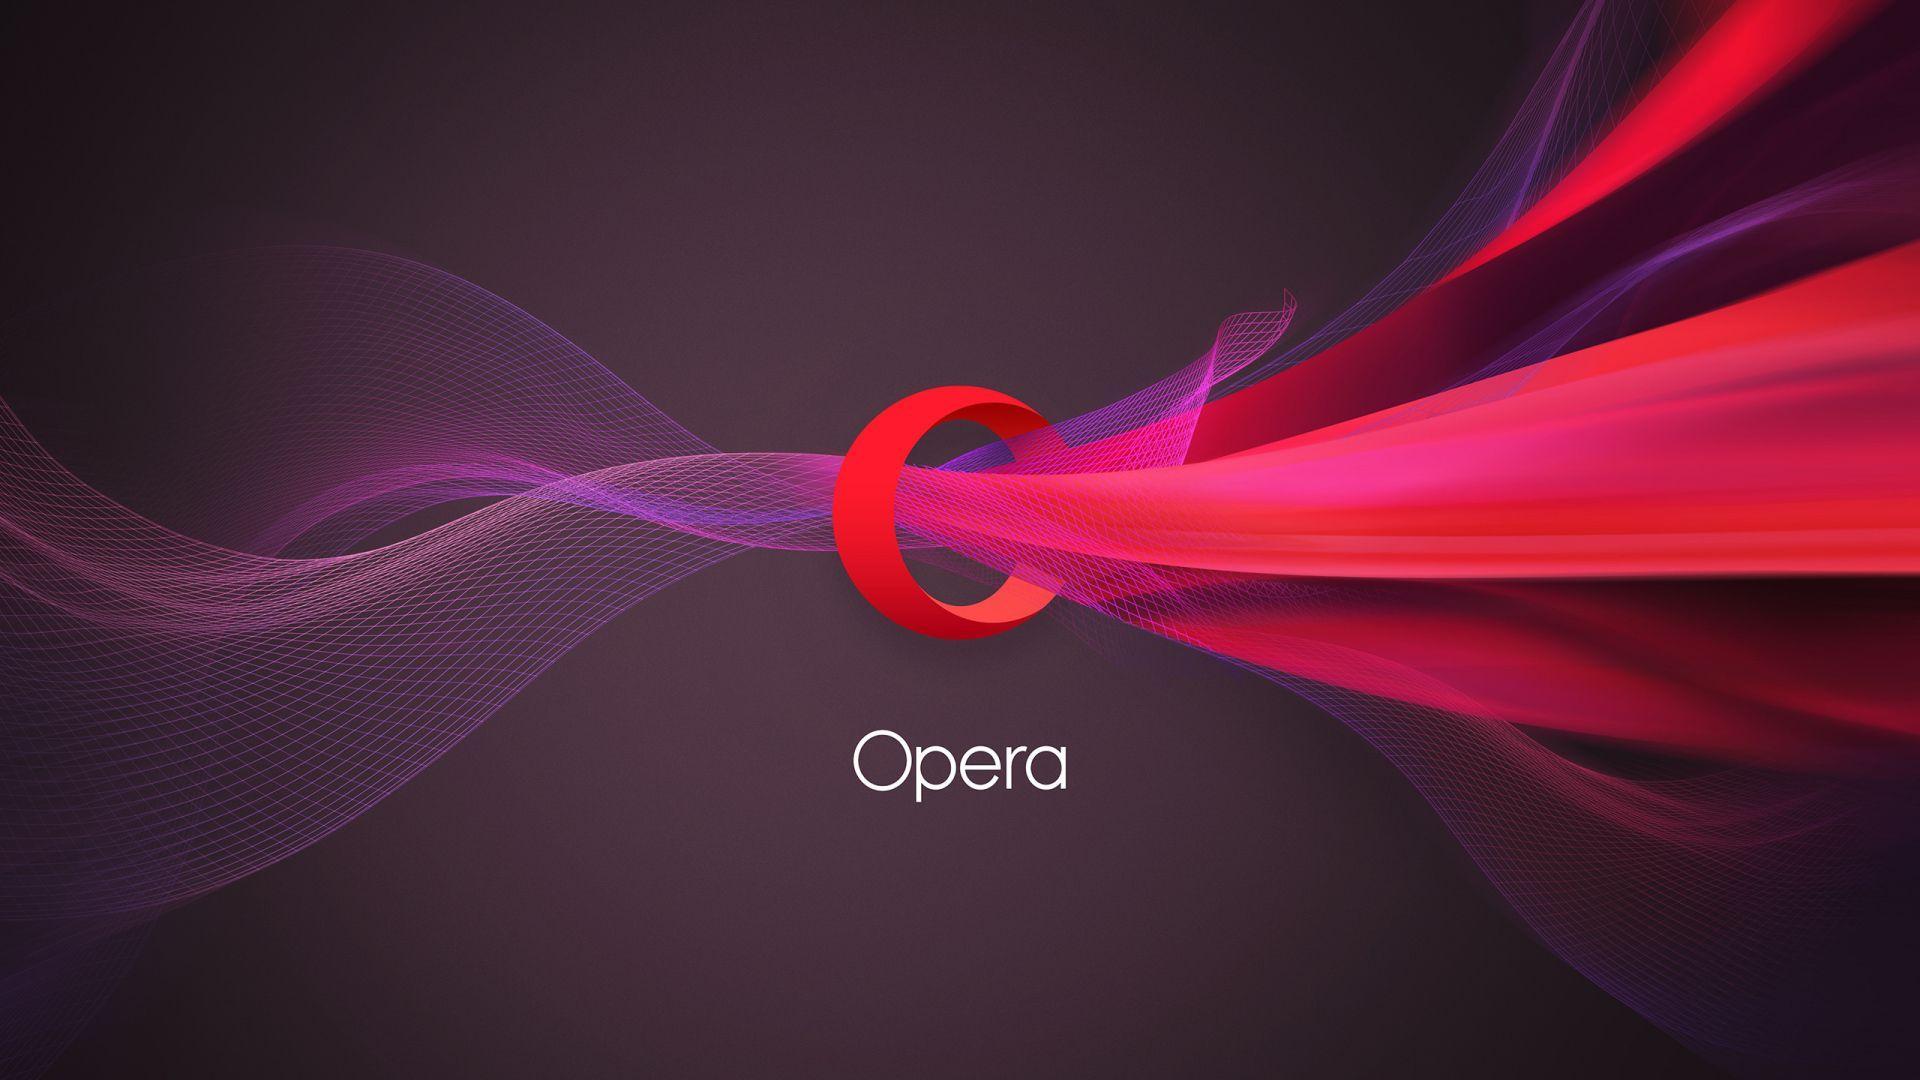 Opera Wallpapers Top Free Opera Backgrounds Wallpaperaccess